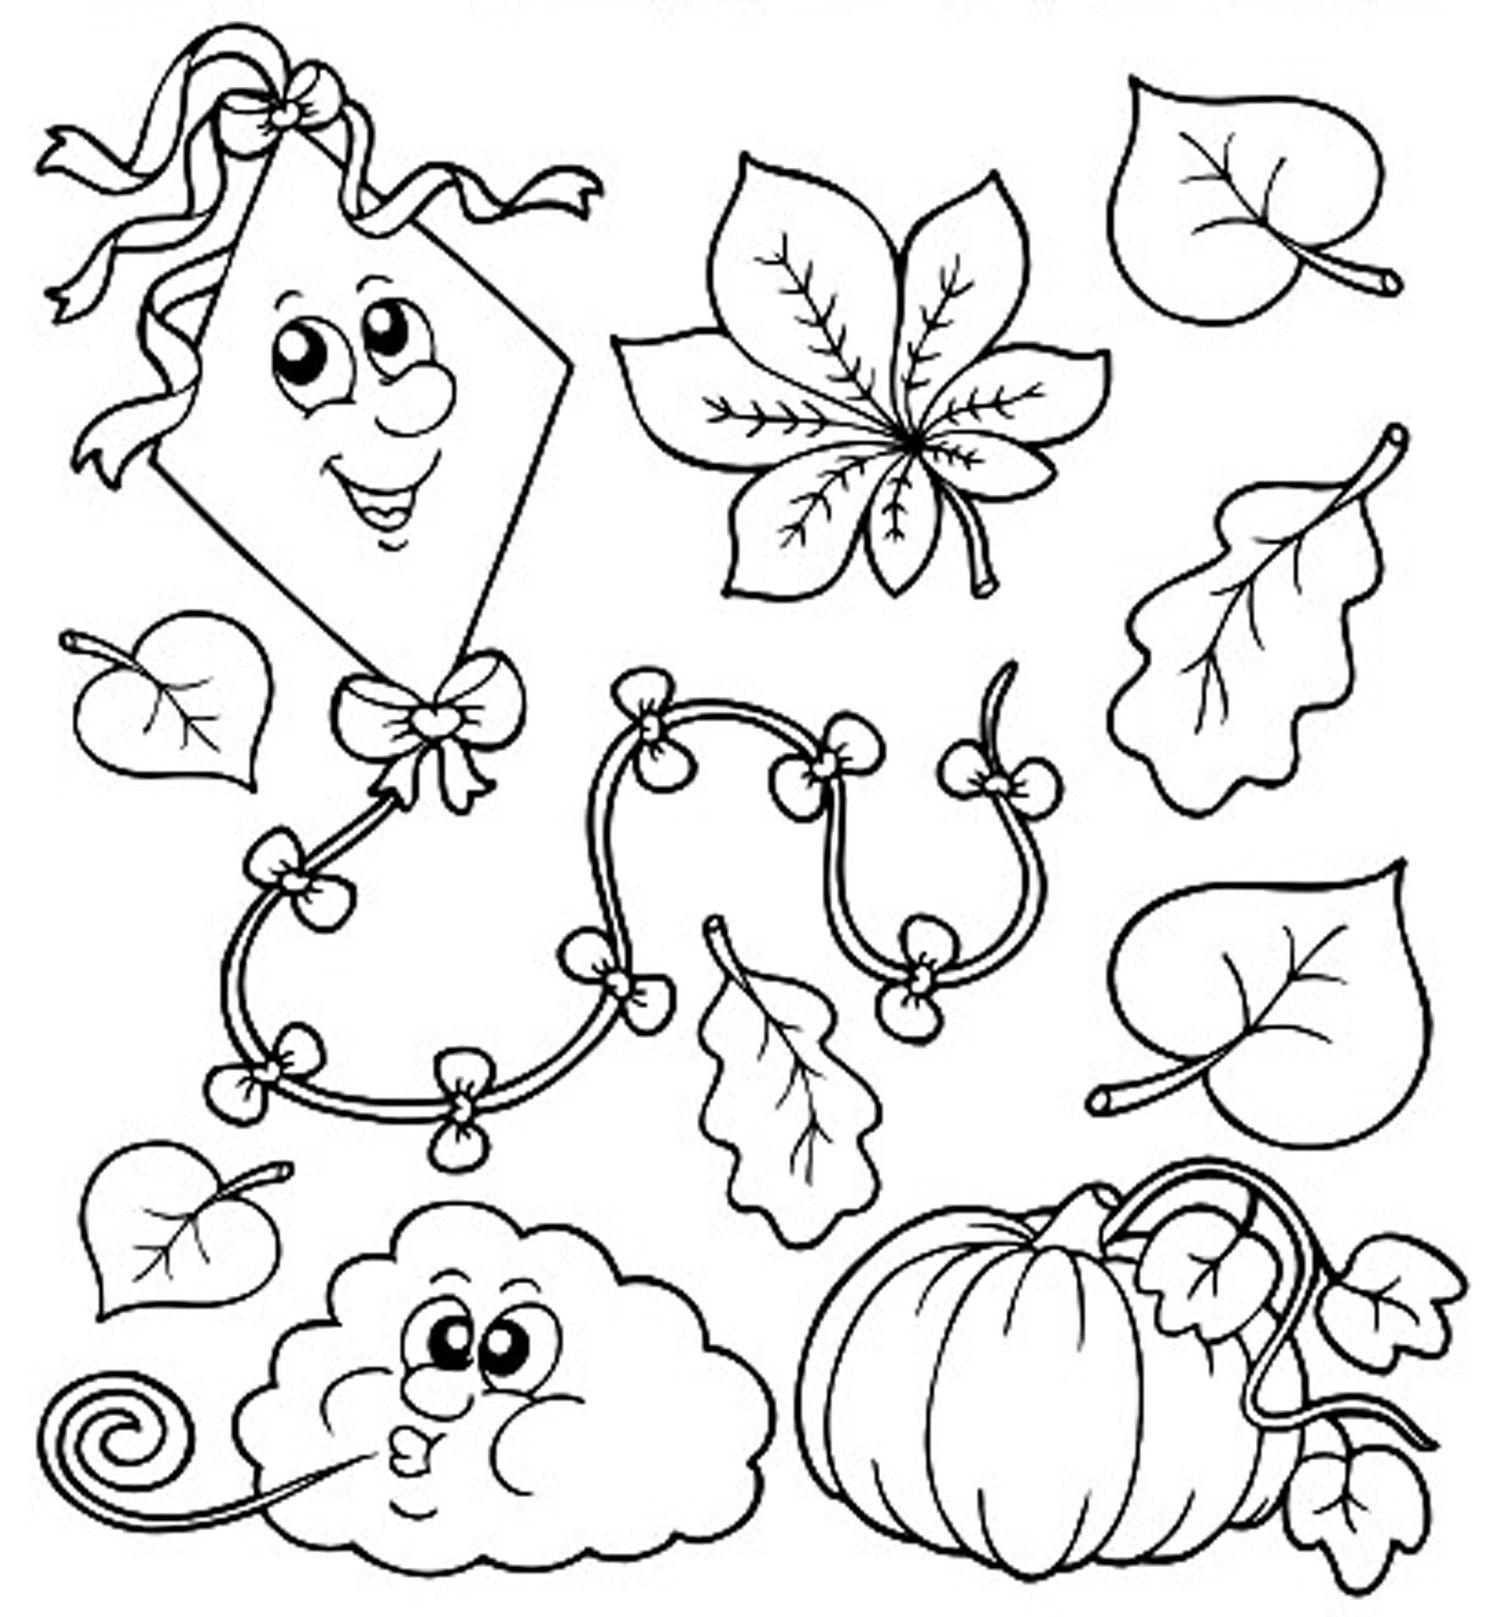 Fall Coloring For Children Season Introduction | Dear Joya | Kids ...